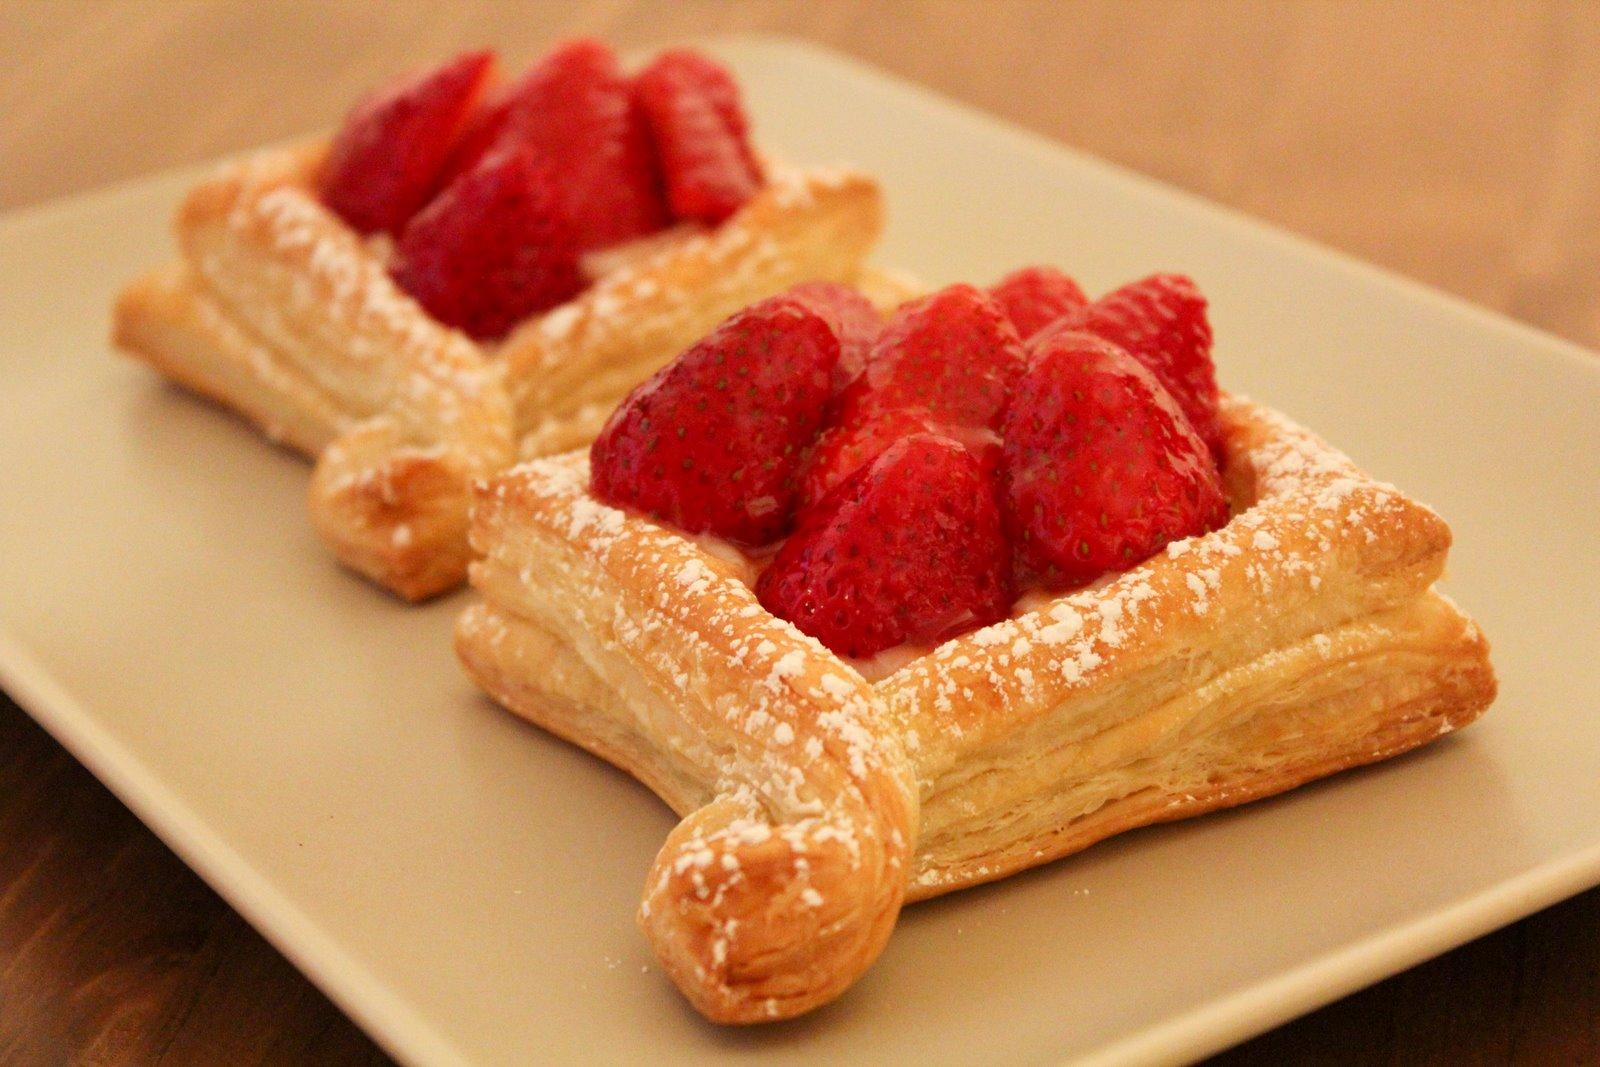 Cest Sucr233 Strawberry pastry cream tarts